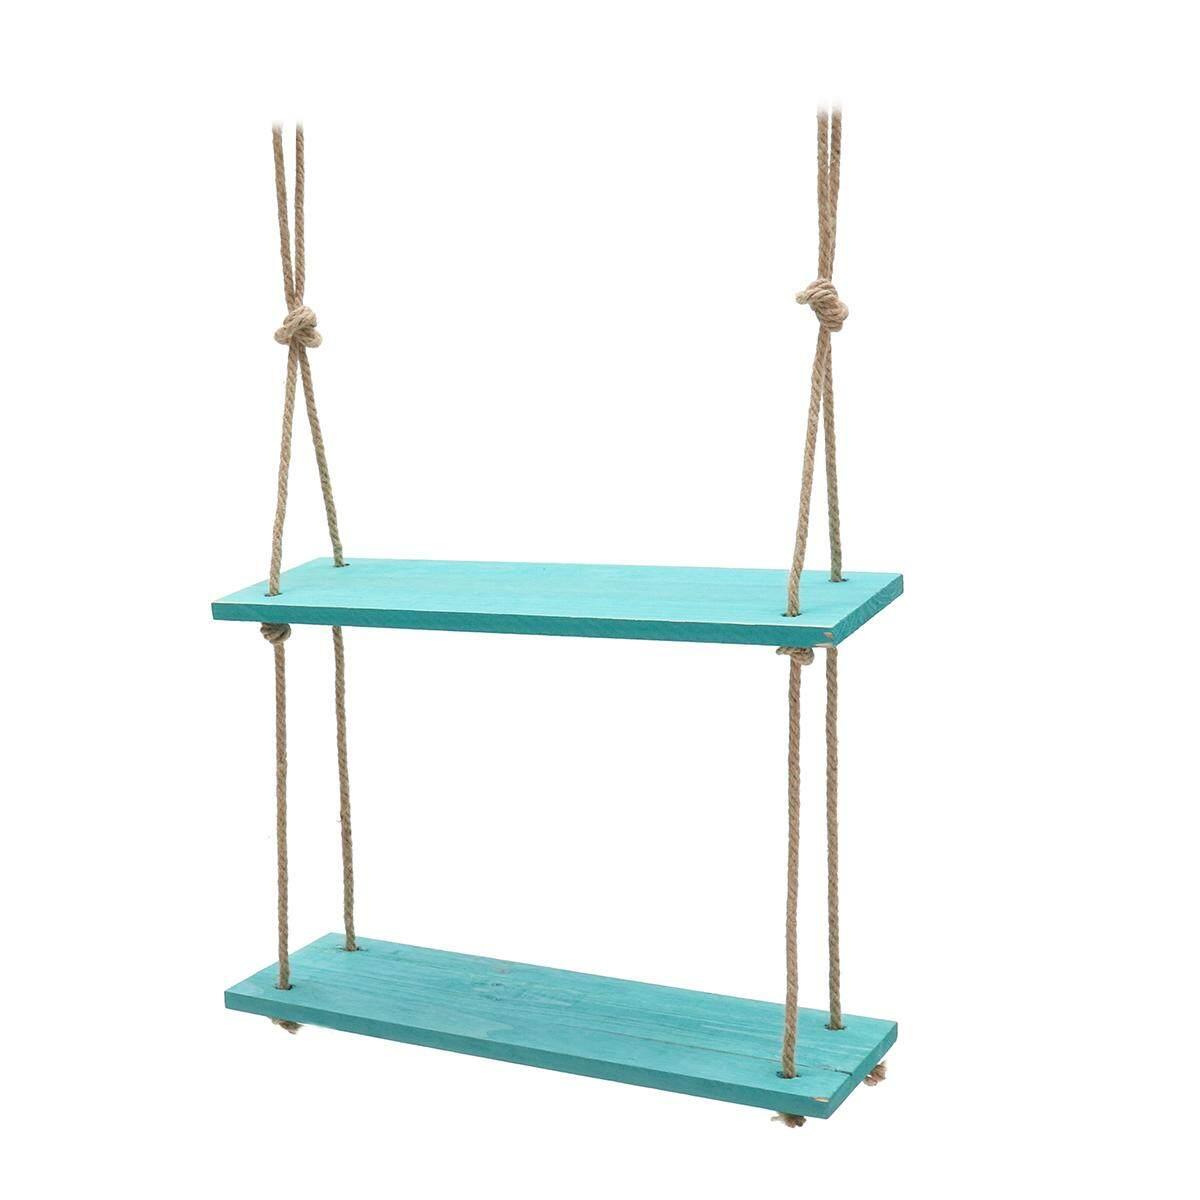 Solid Wood Wall Shelf Storage Floating Wall Shelf Rustic Vintage Rope Shelf Blue 2 Tiers - intl